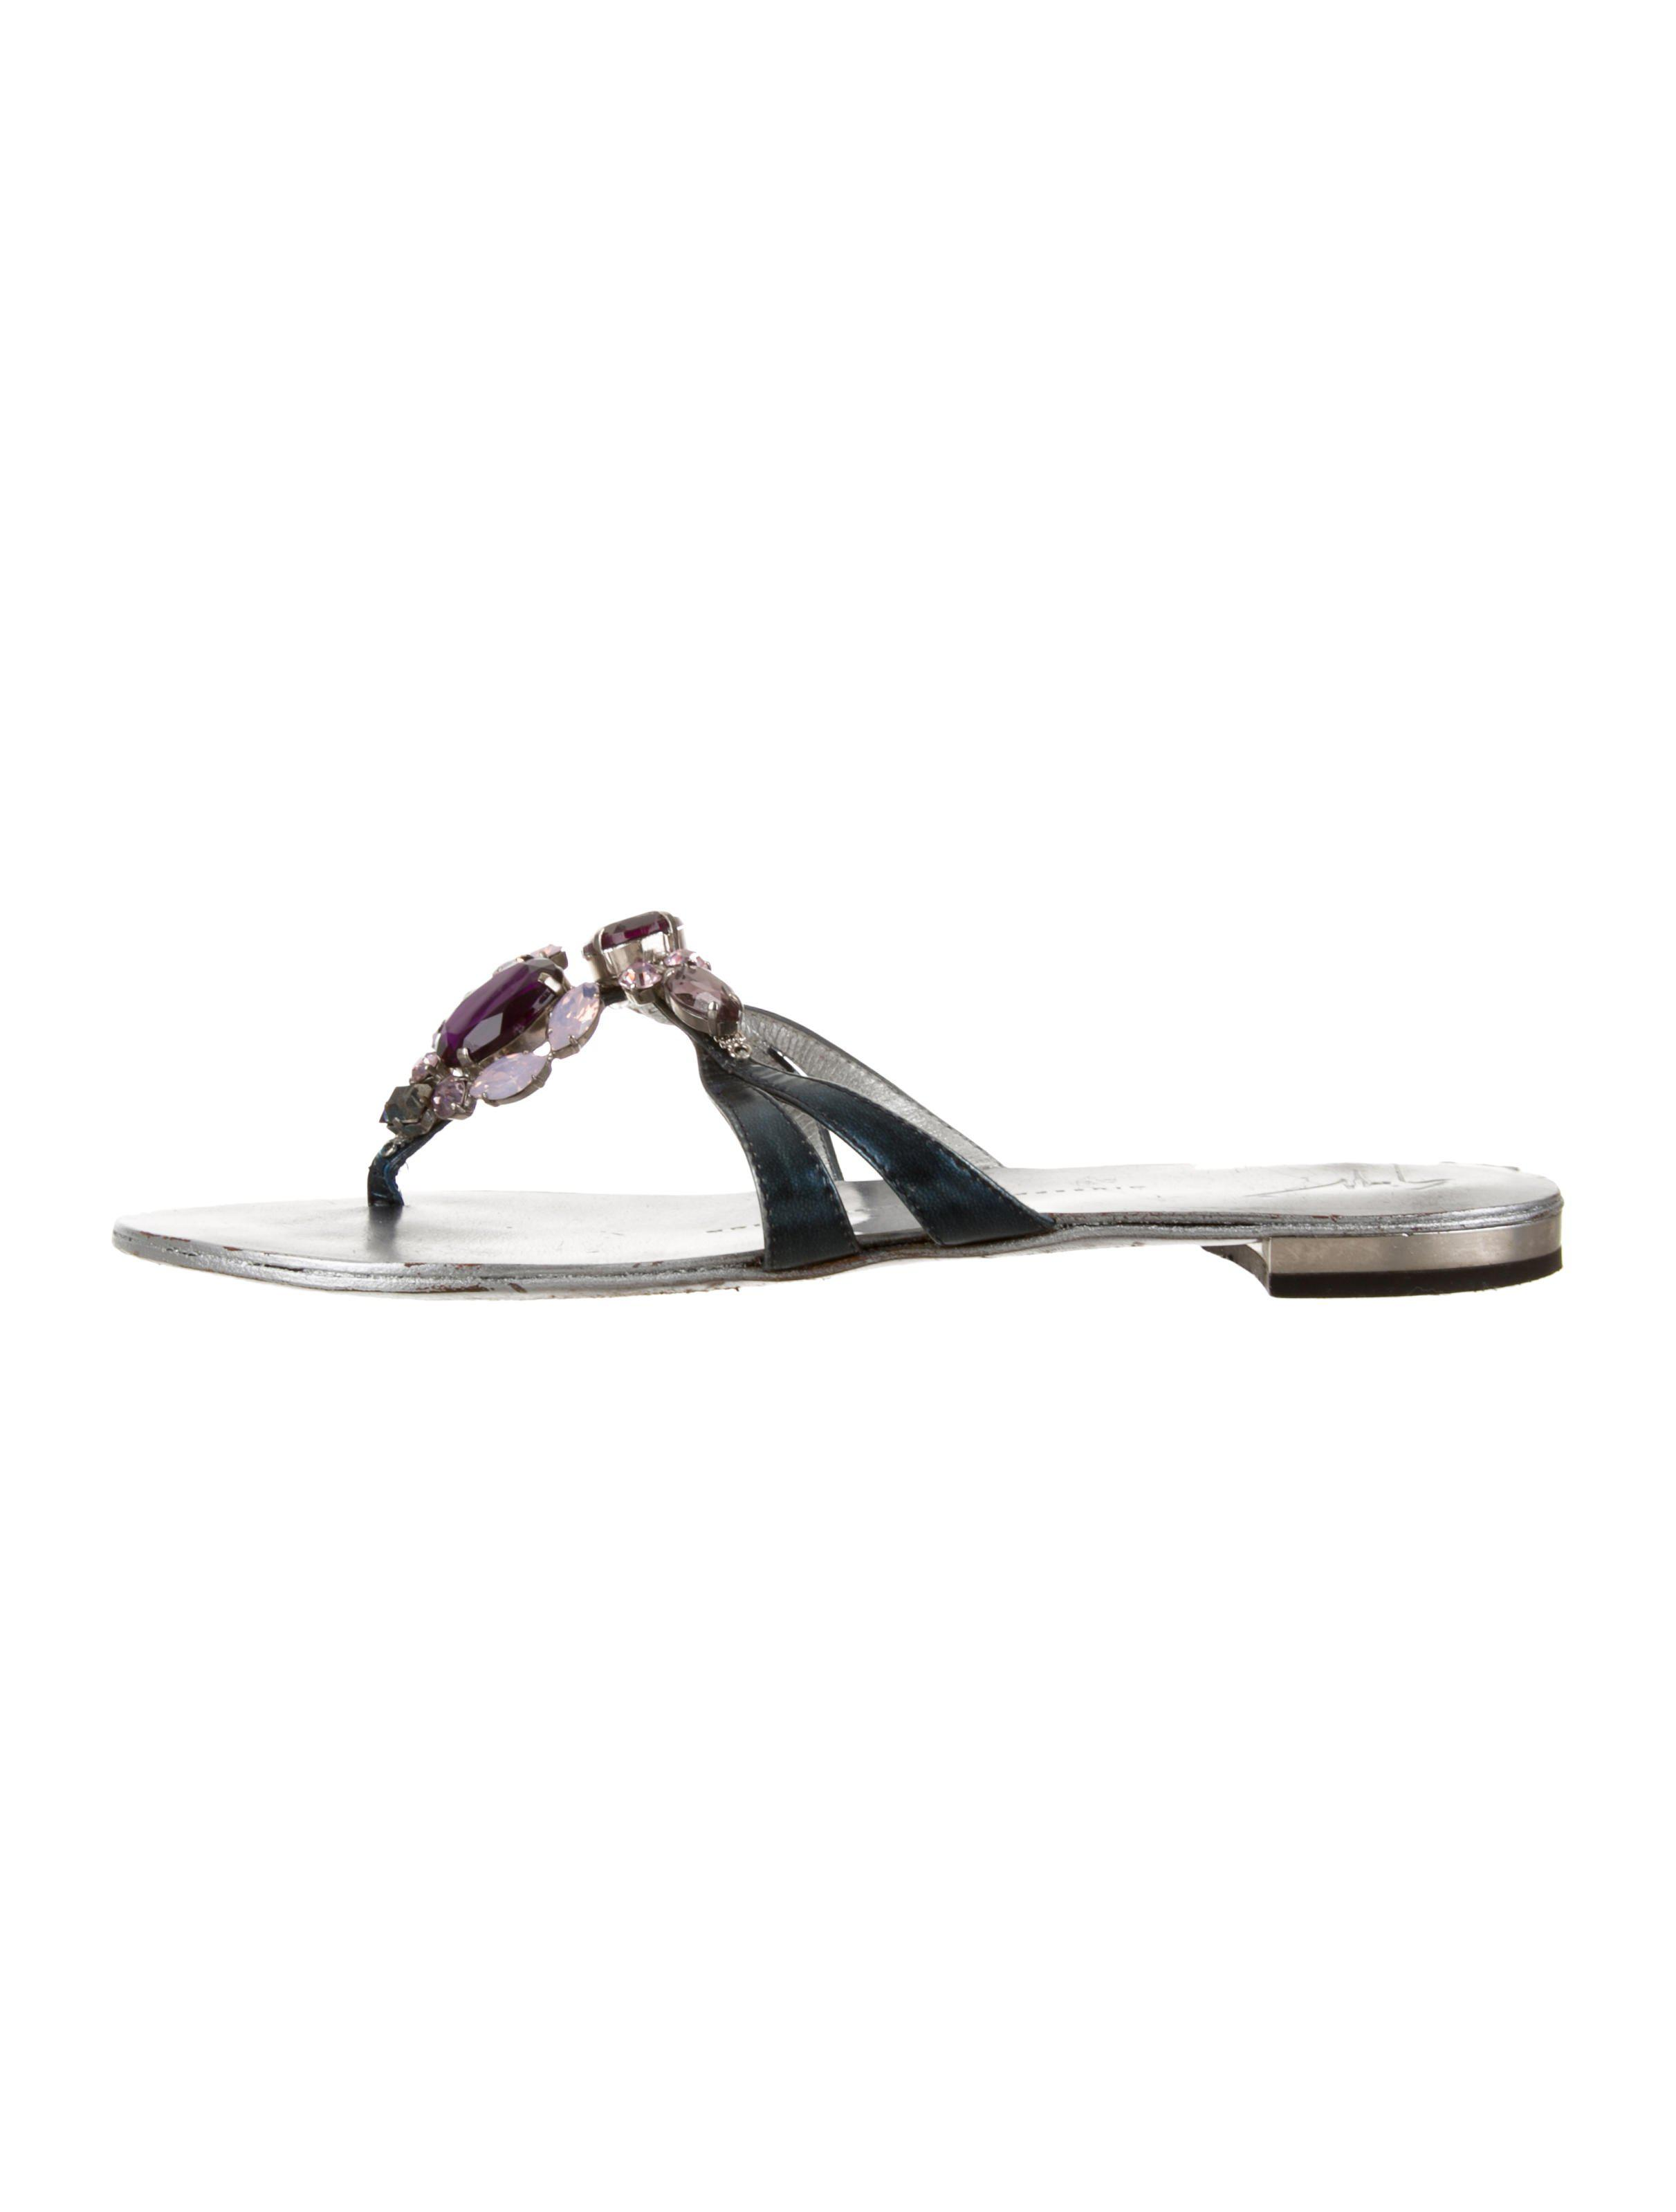 ed0c1366ea128 Lyst - Giuseppe Zanotti Jewel-embellished Thong Sandals Blue in Metallic